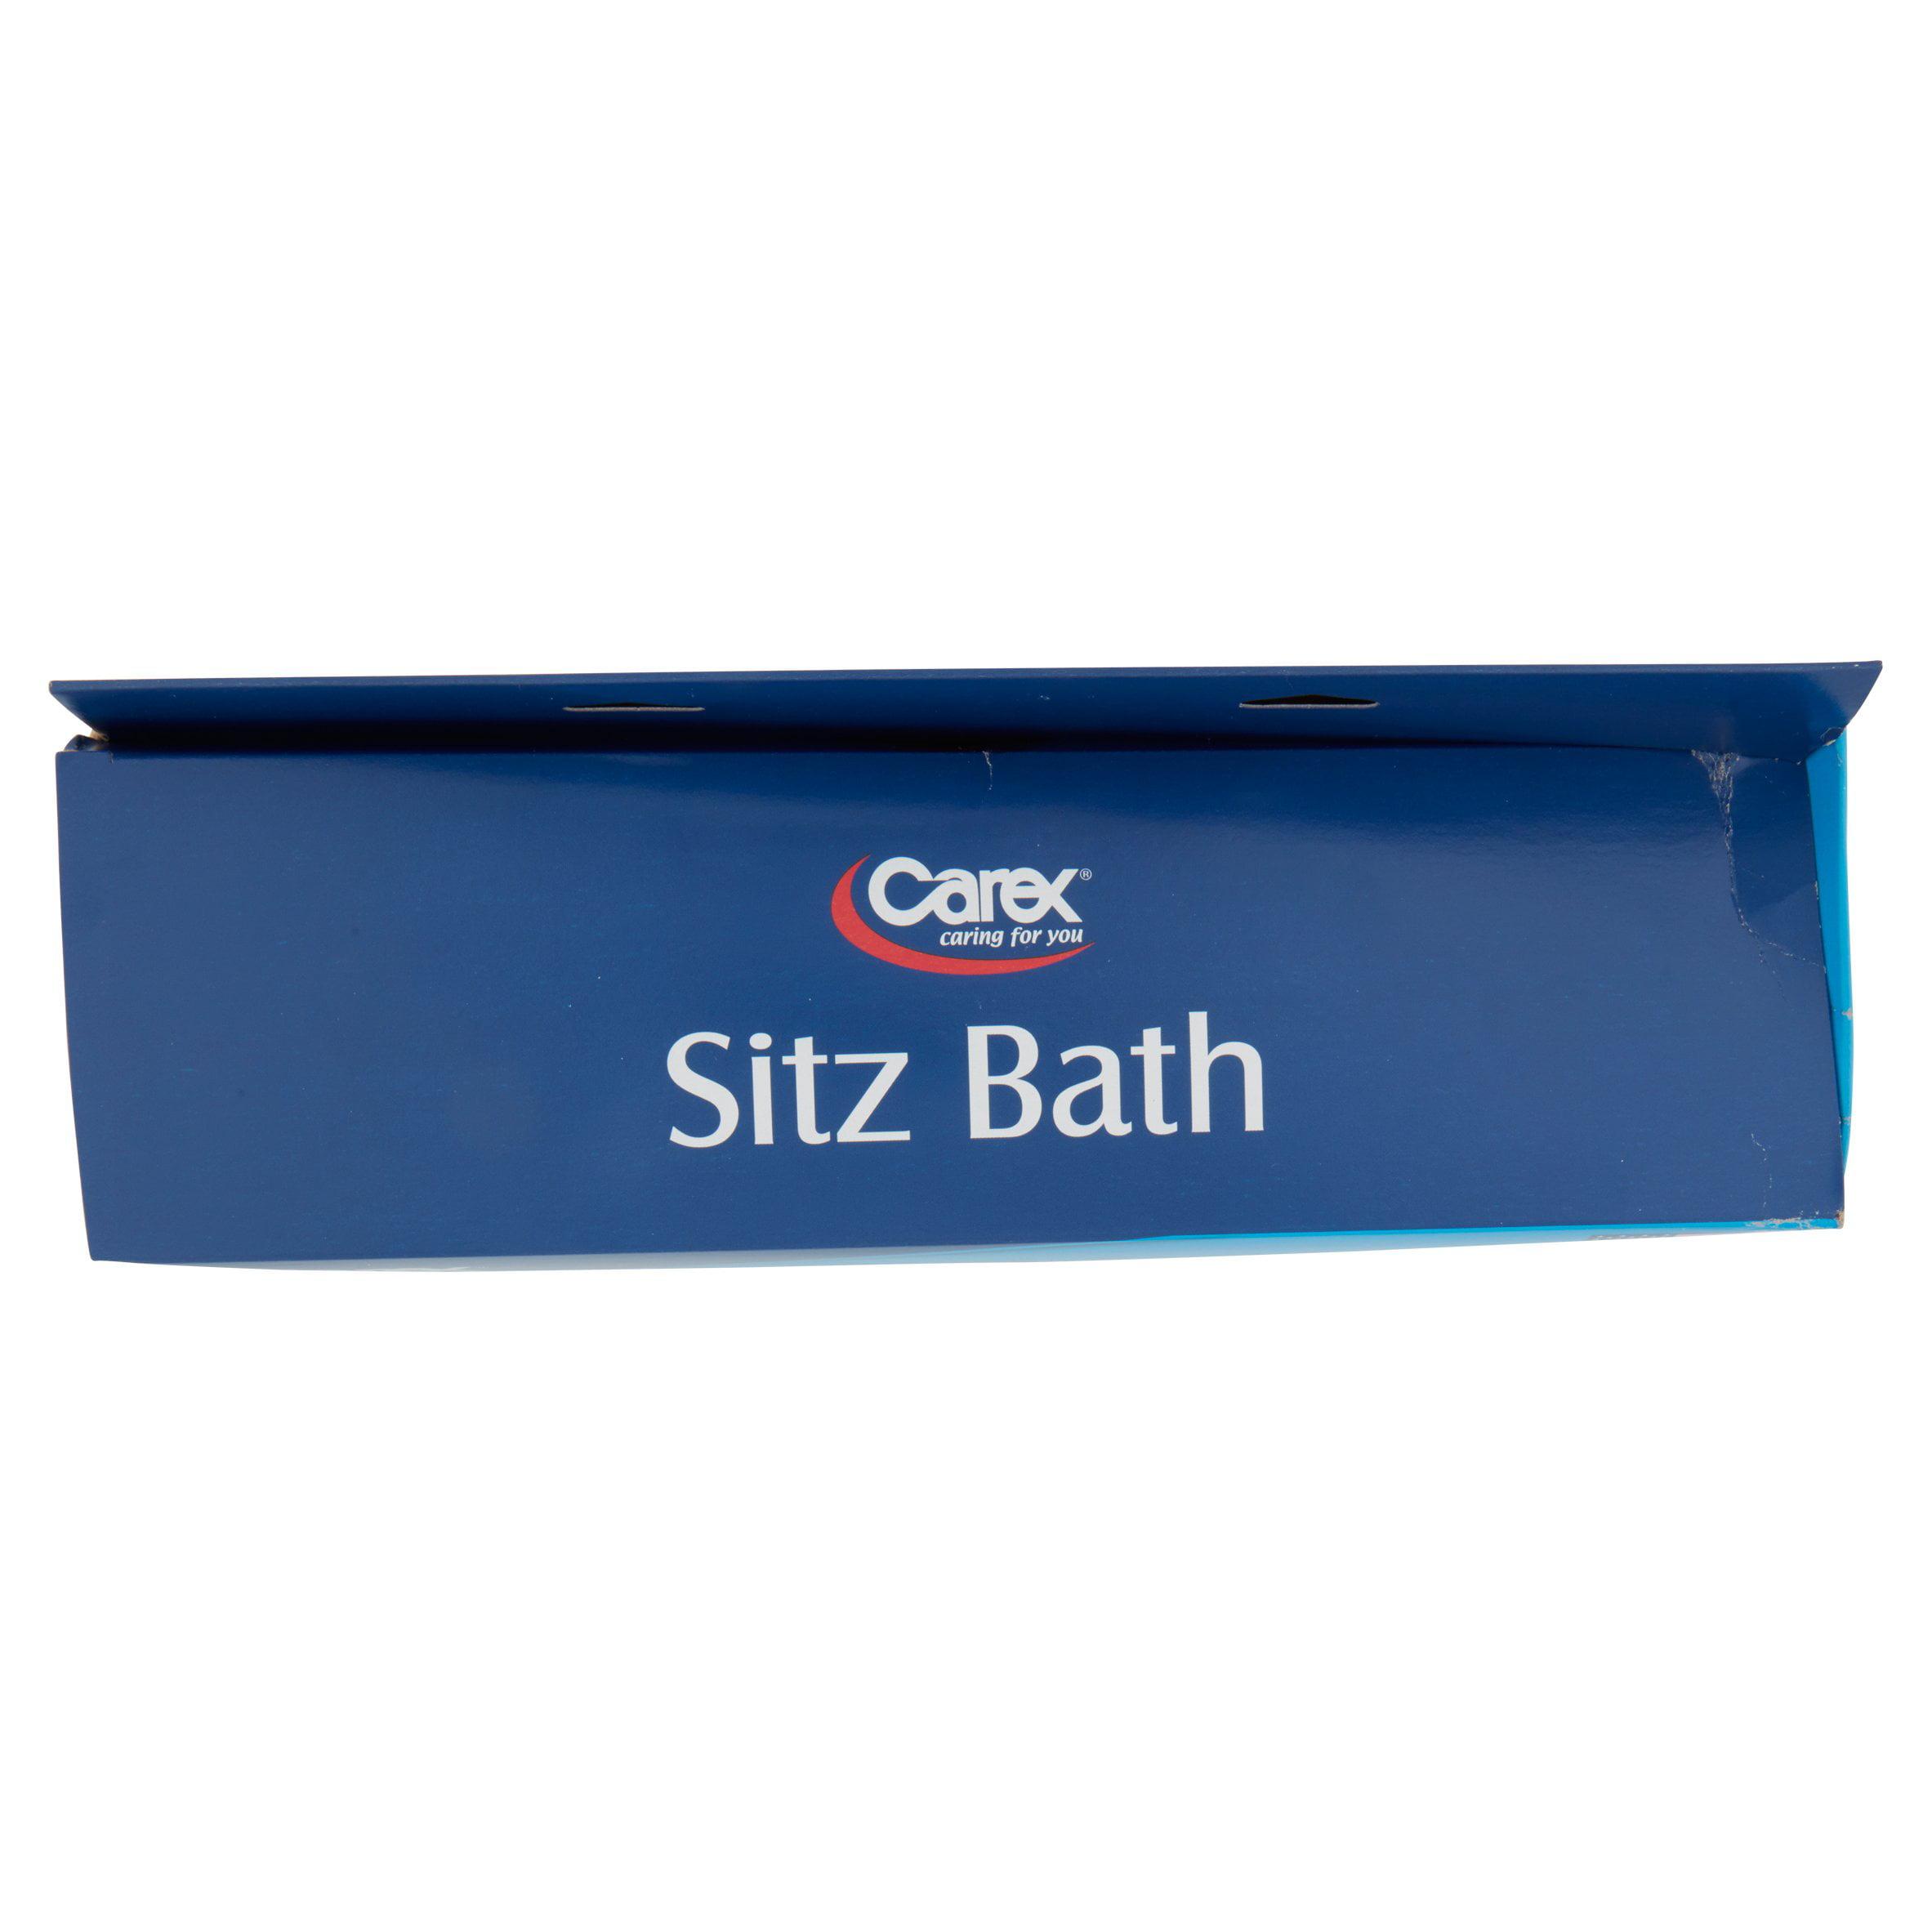 Carex Sitz Bath - Walmart.com